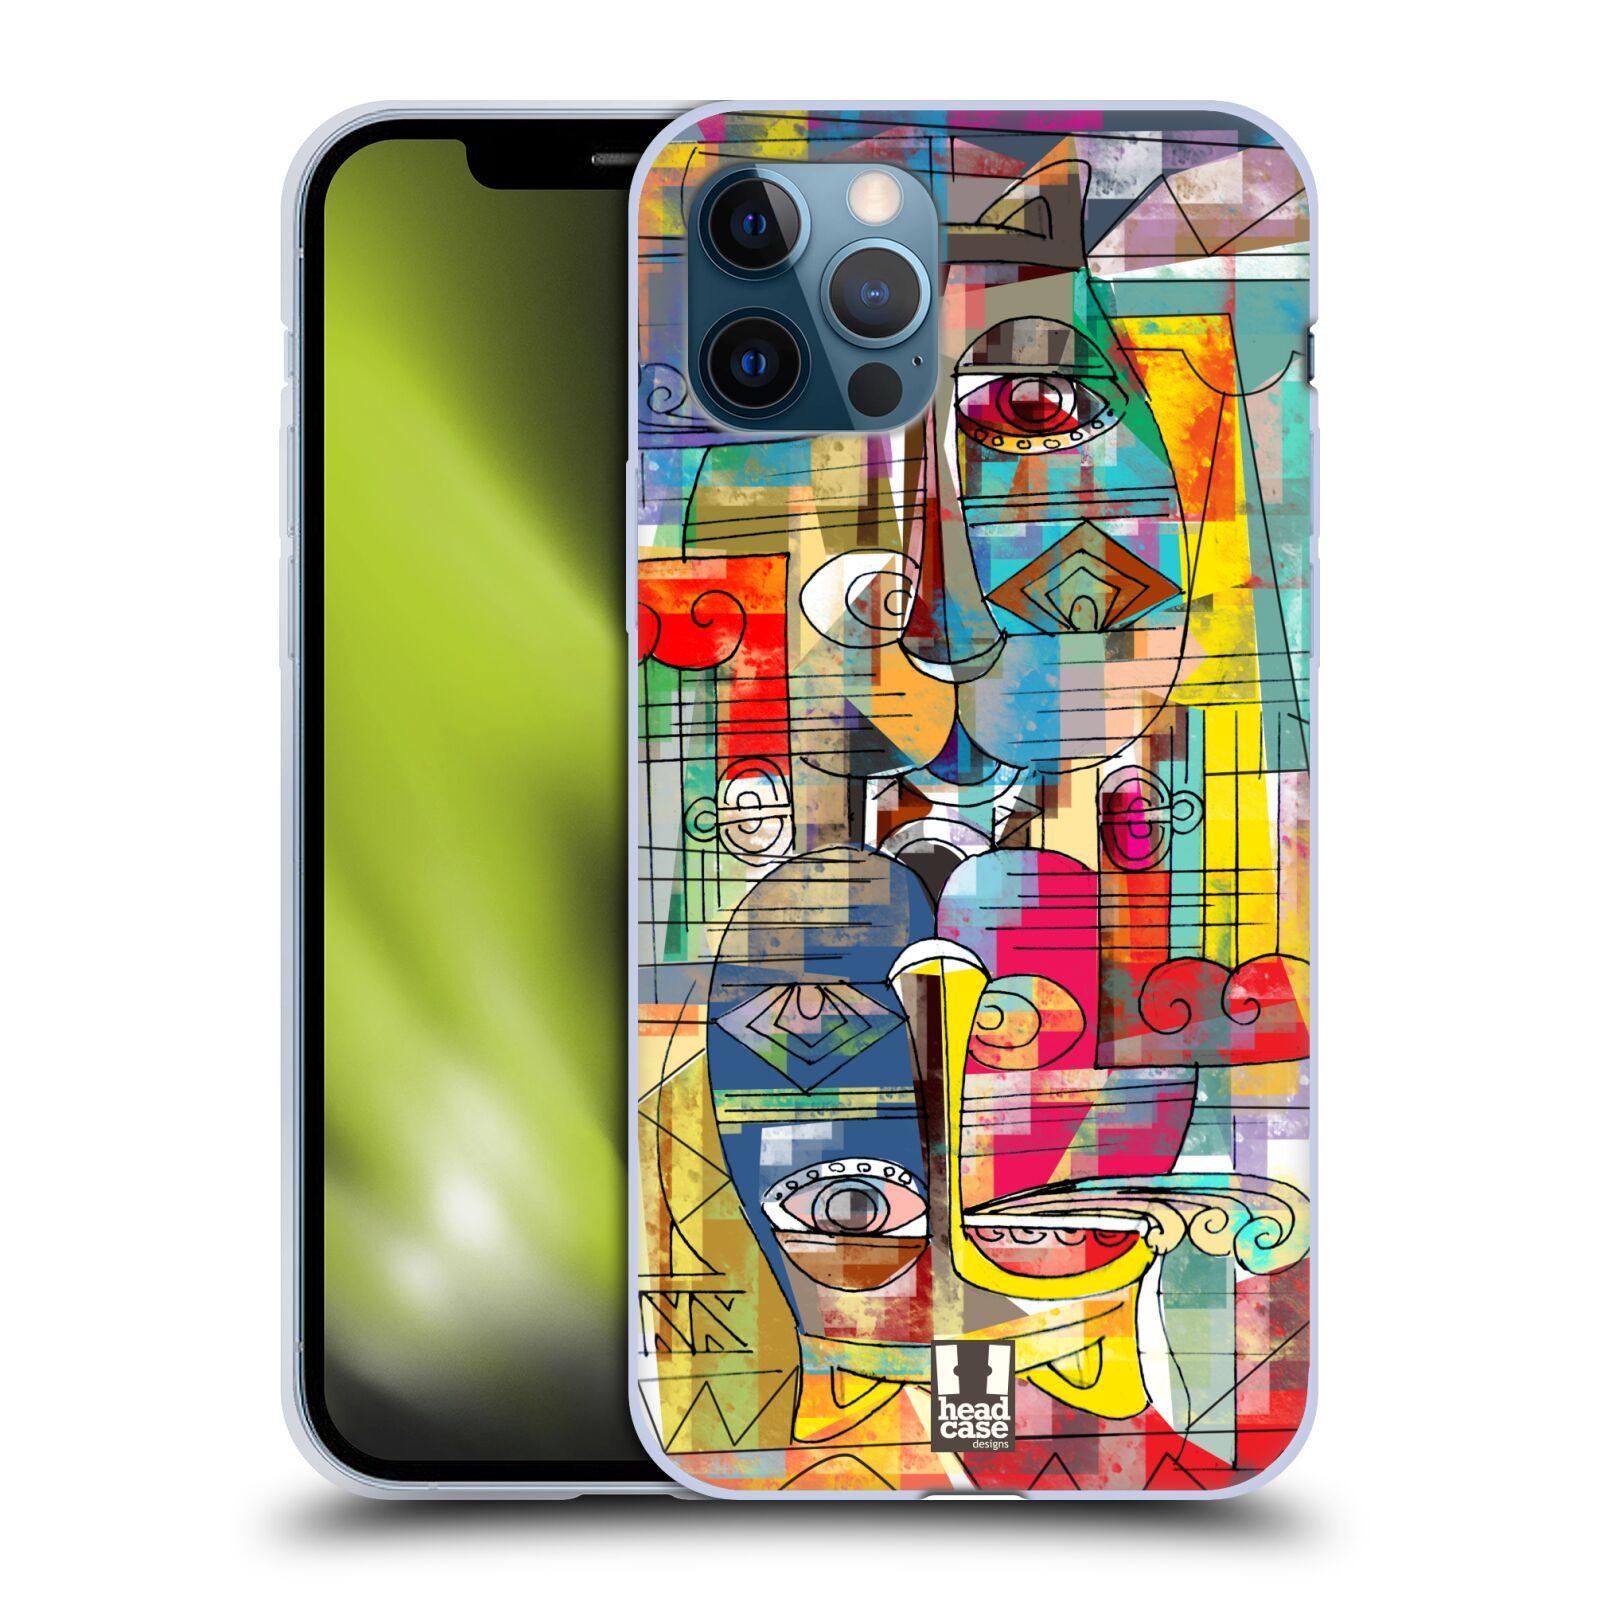 Silikonové pouzdro na mobil Apple iPhone 12 / 12 Pro - Head Case - AZTEC MANX